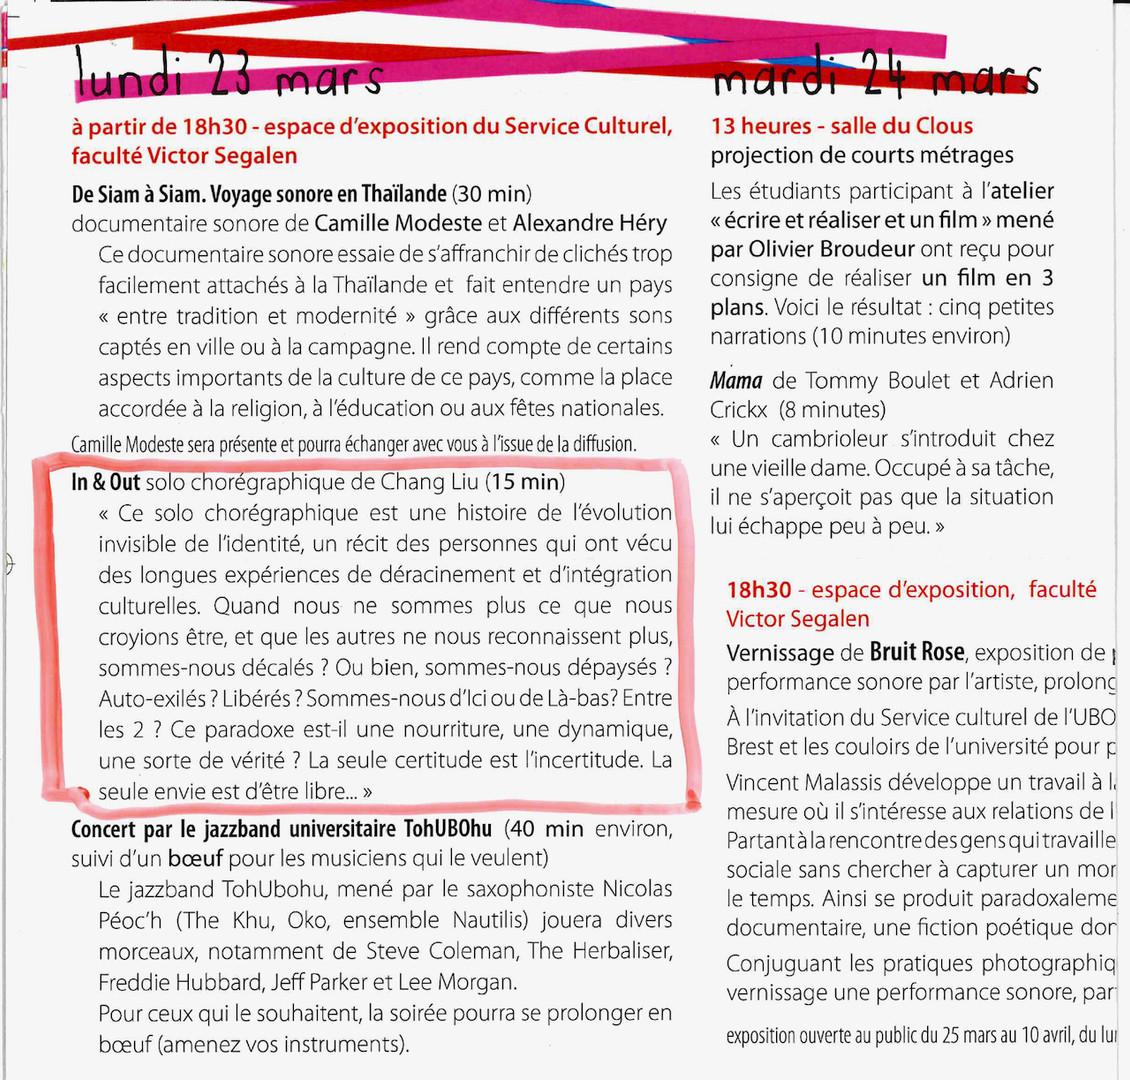 In & Out UBO ROI   LIV CHANG - peinture et danse